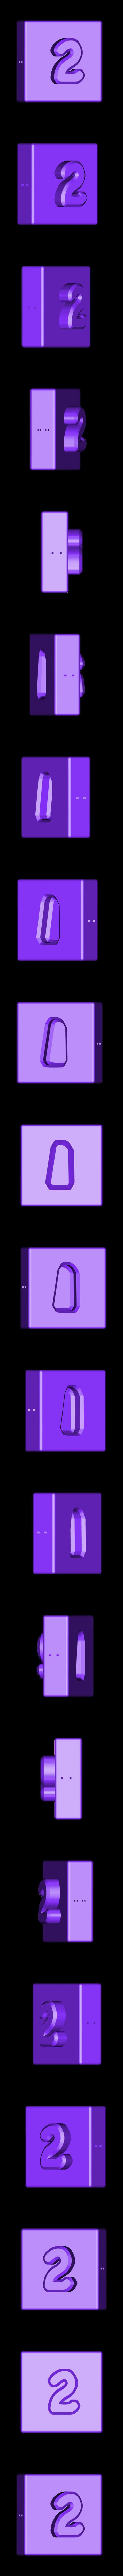 2.stl Download free STL file Mental blocks • Object to 3D print, RevK